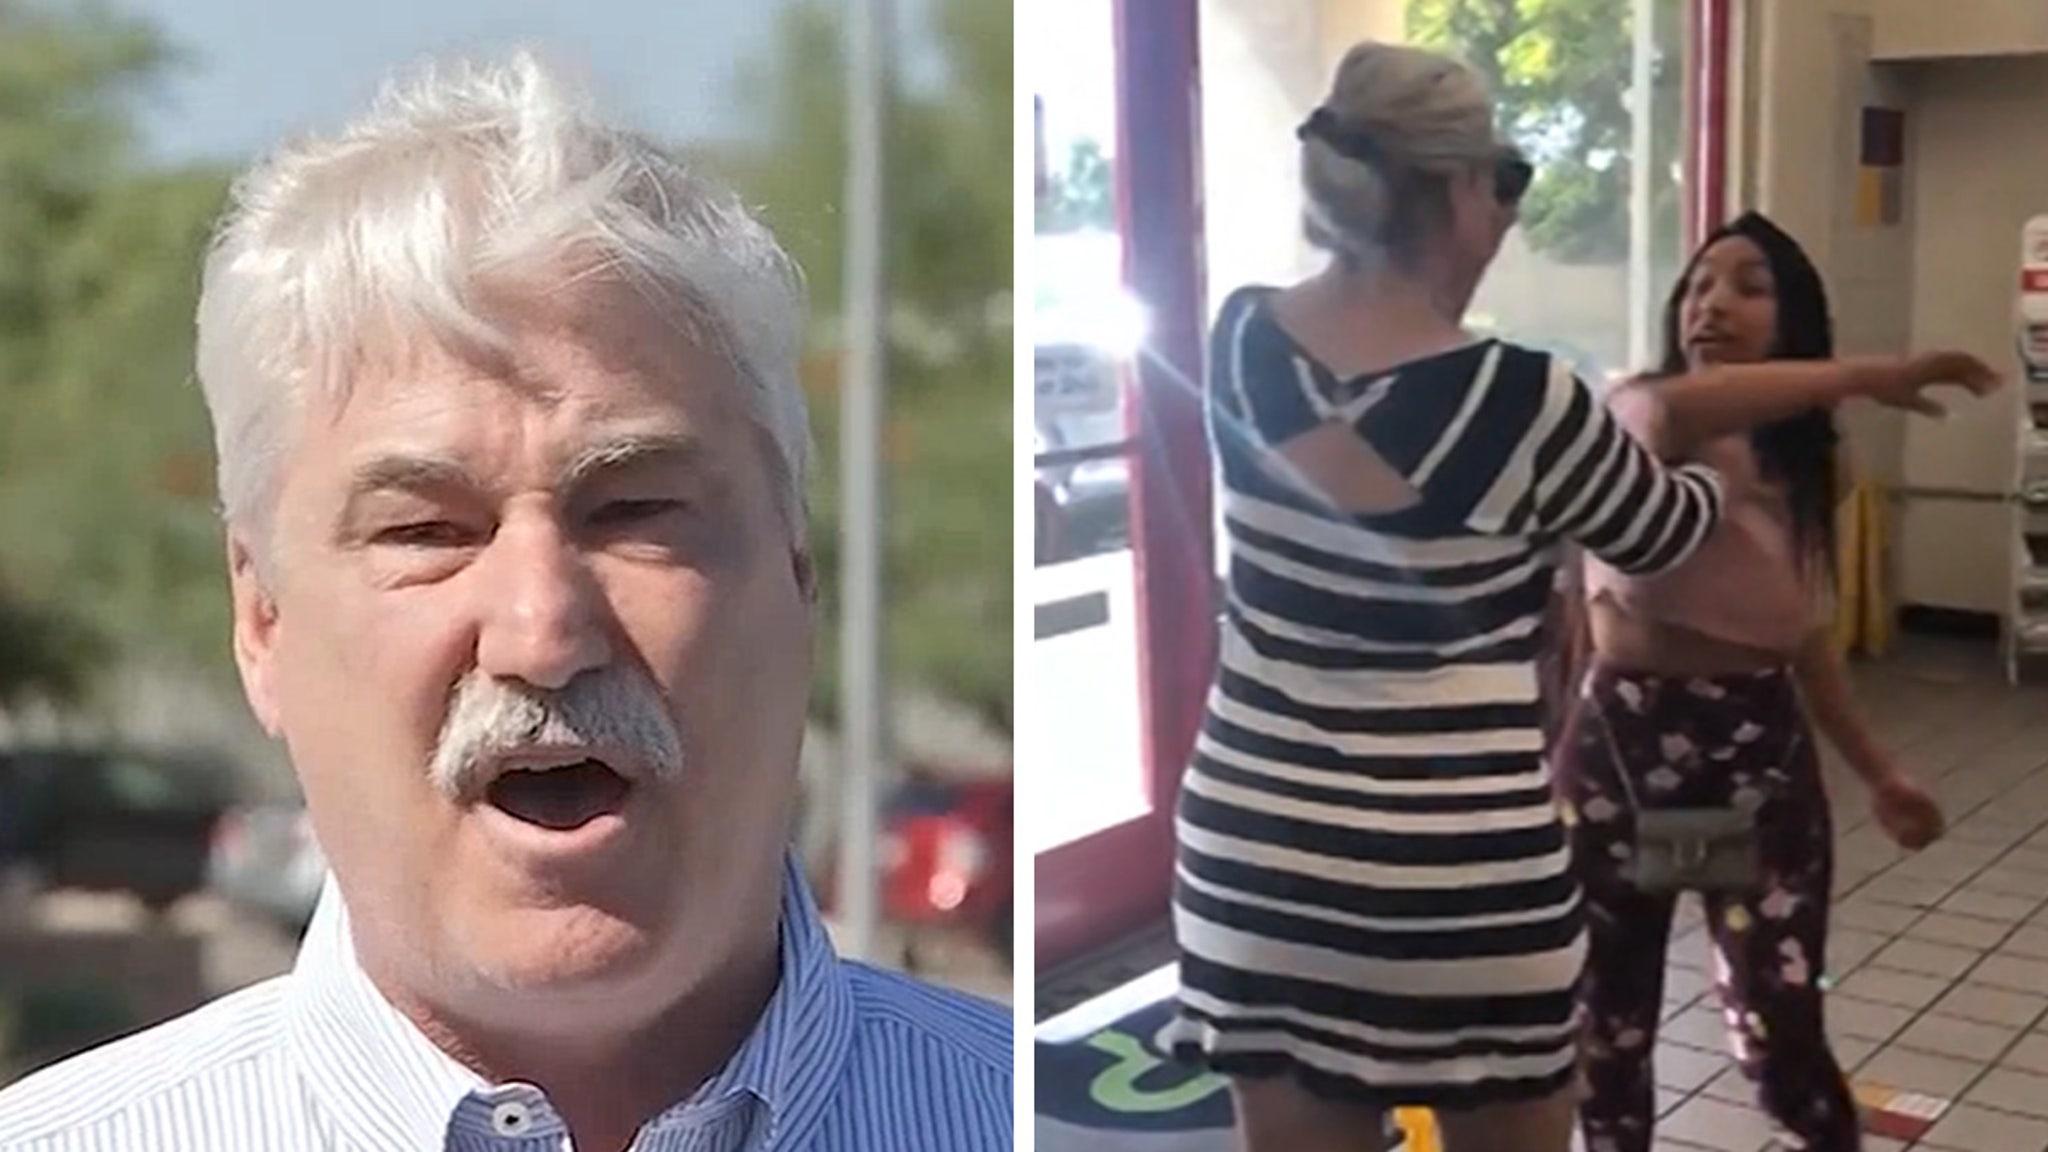 Husband of Phoenix 'Karen' Gives Tearful Apology, Says Mental Illness to Blame